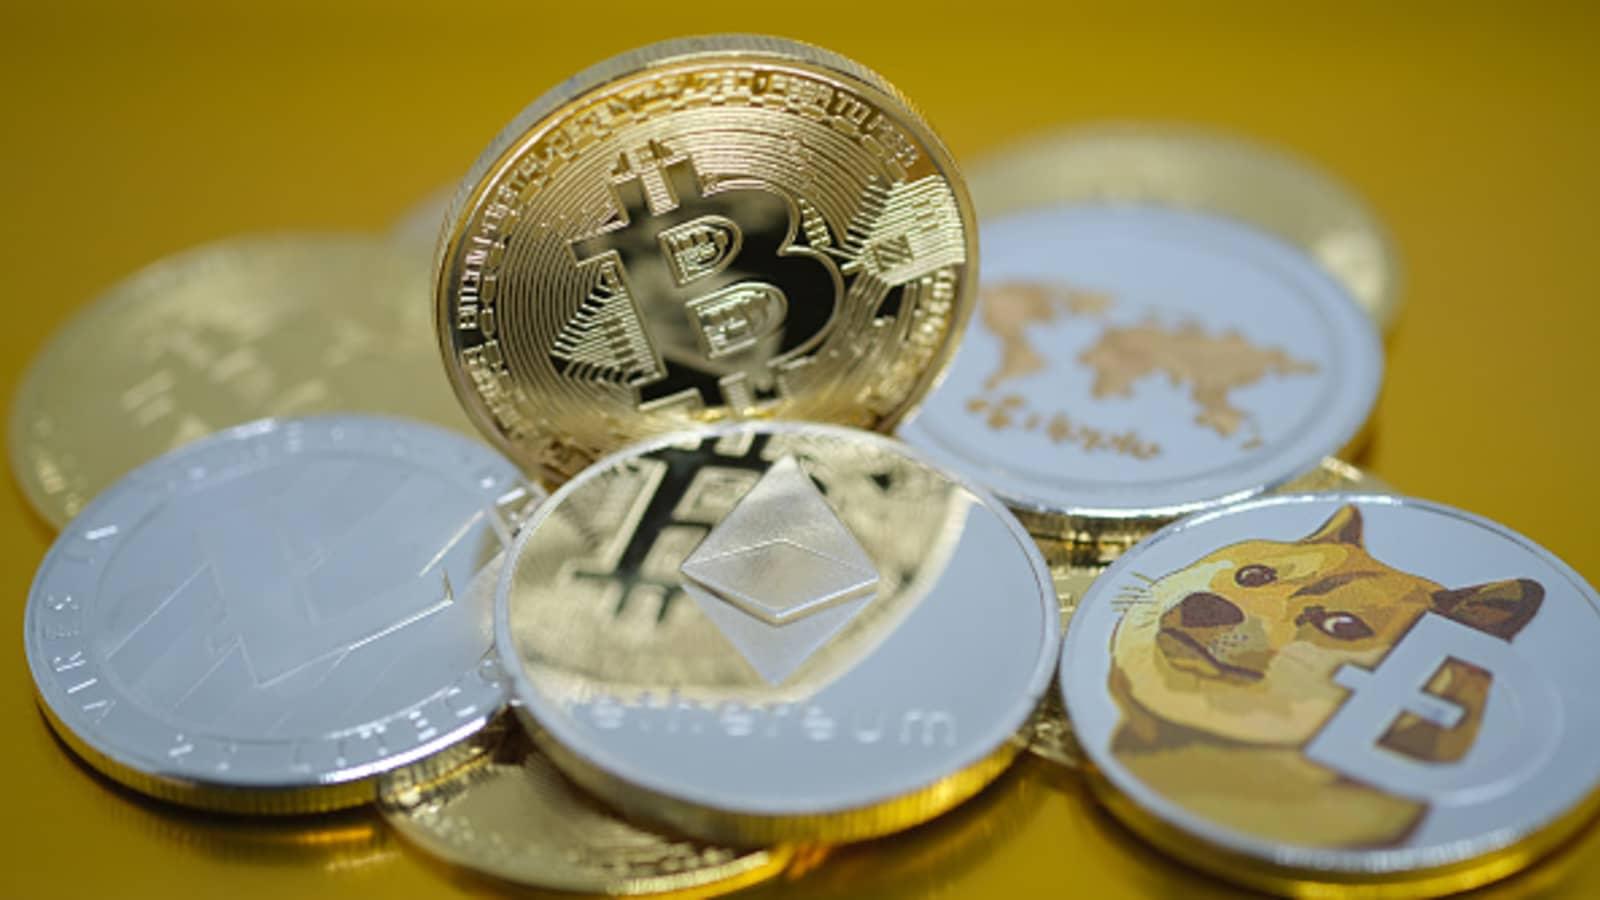 Reddit crypto currency trading handicap betting sportsbet au